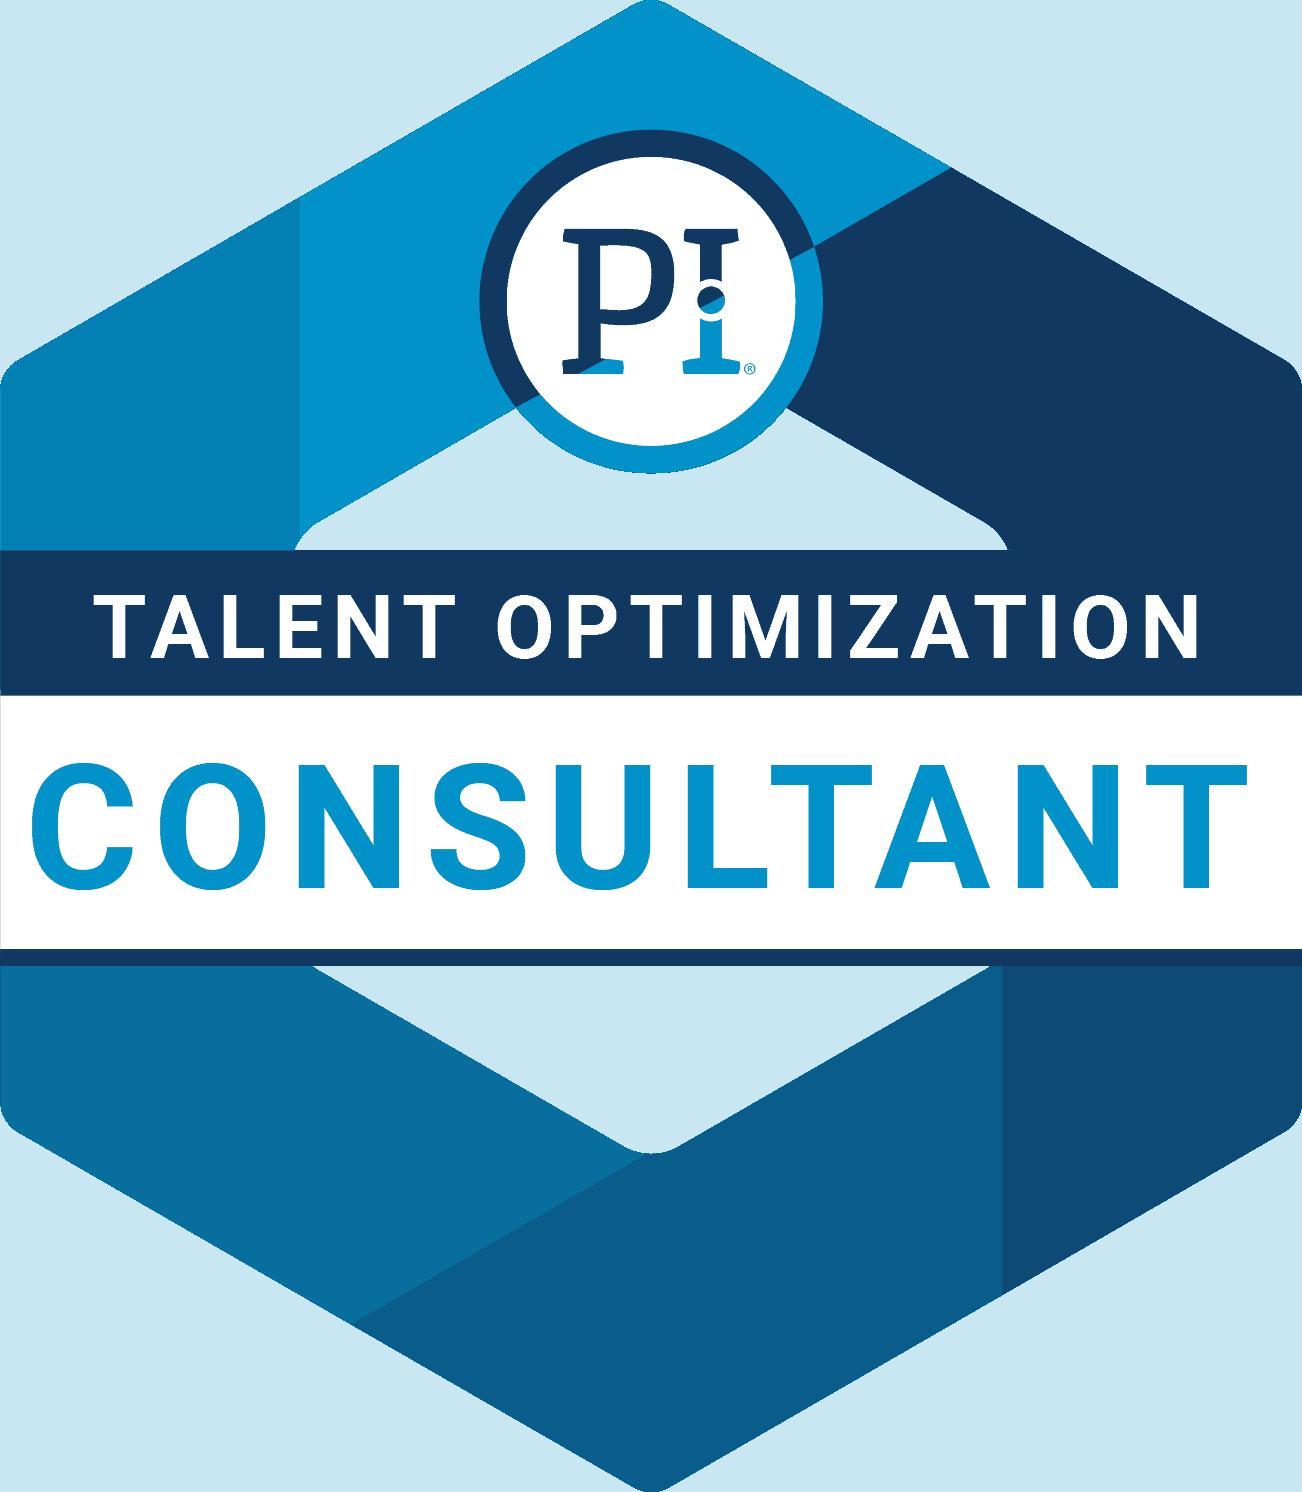 PI-Talent-Optimization-Consultant